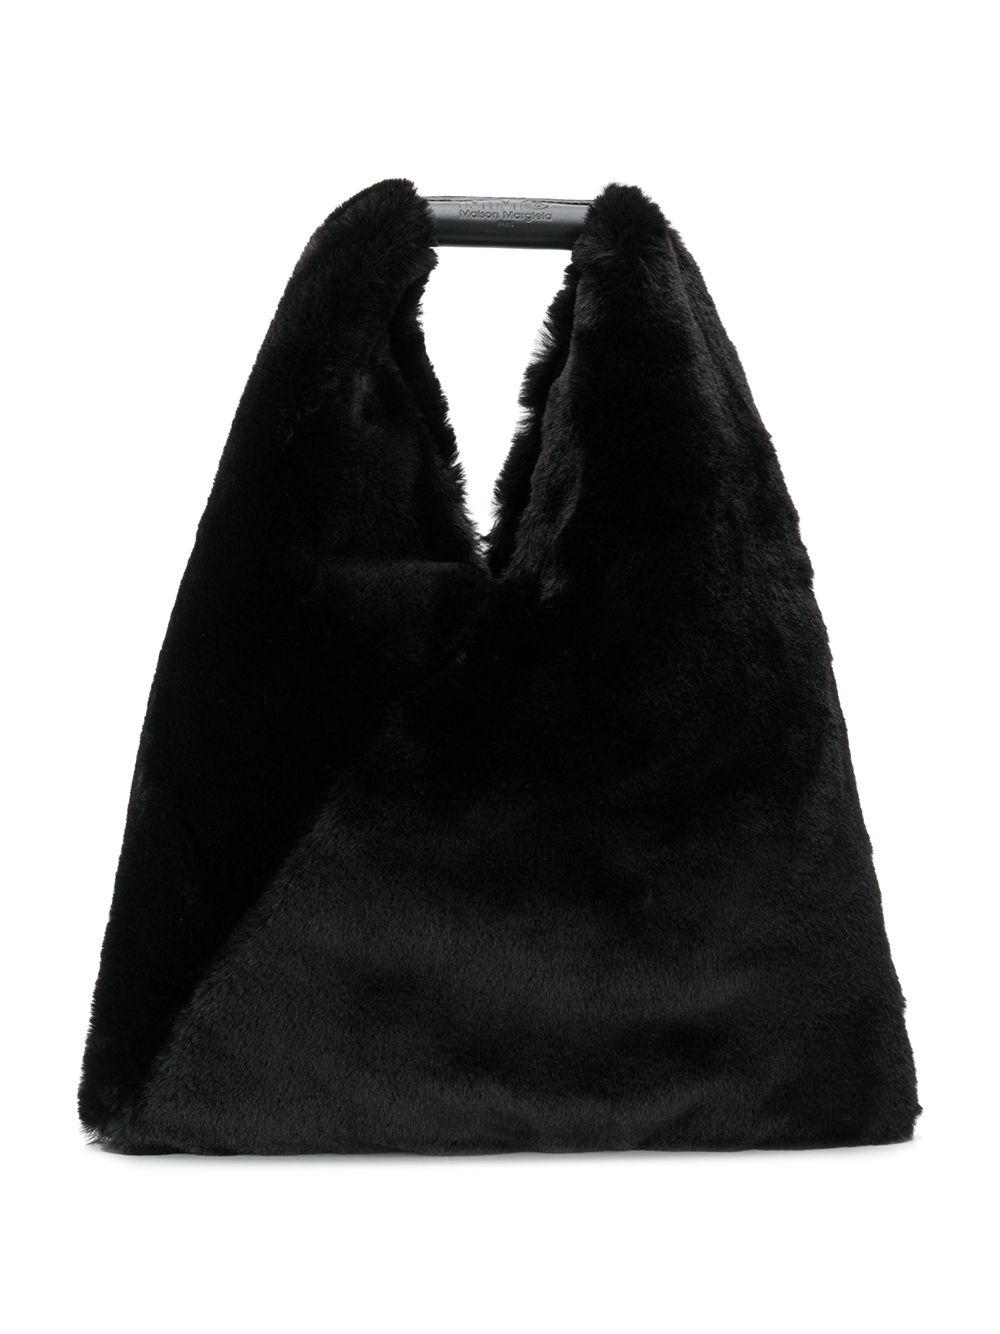 MM6 Maison Margiela | Mm6 Maison Margiela меховая сумка-тоут | Clouty